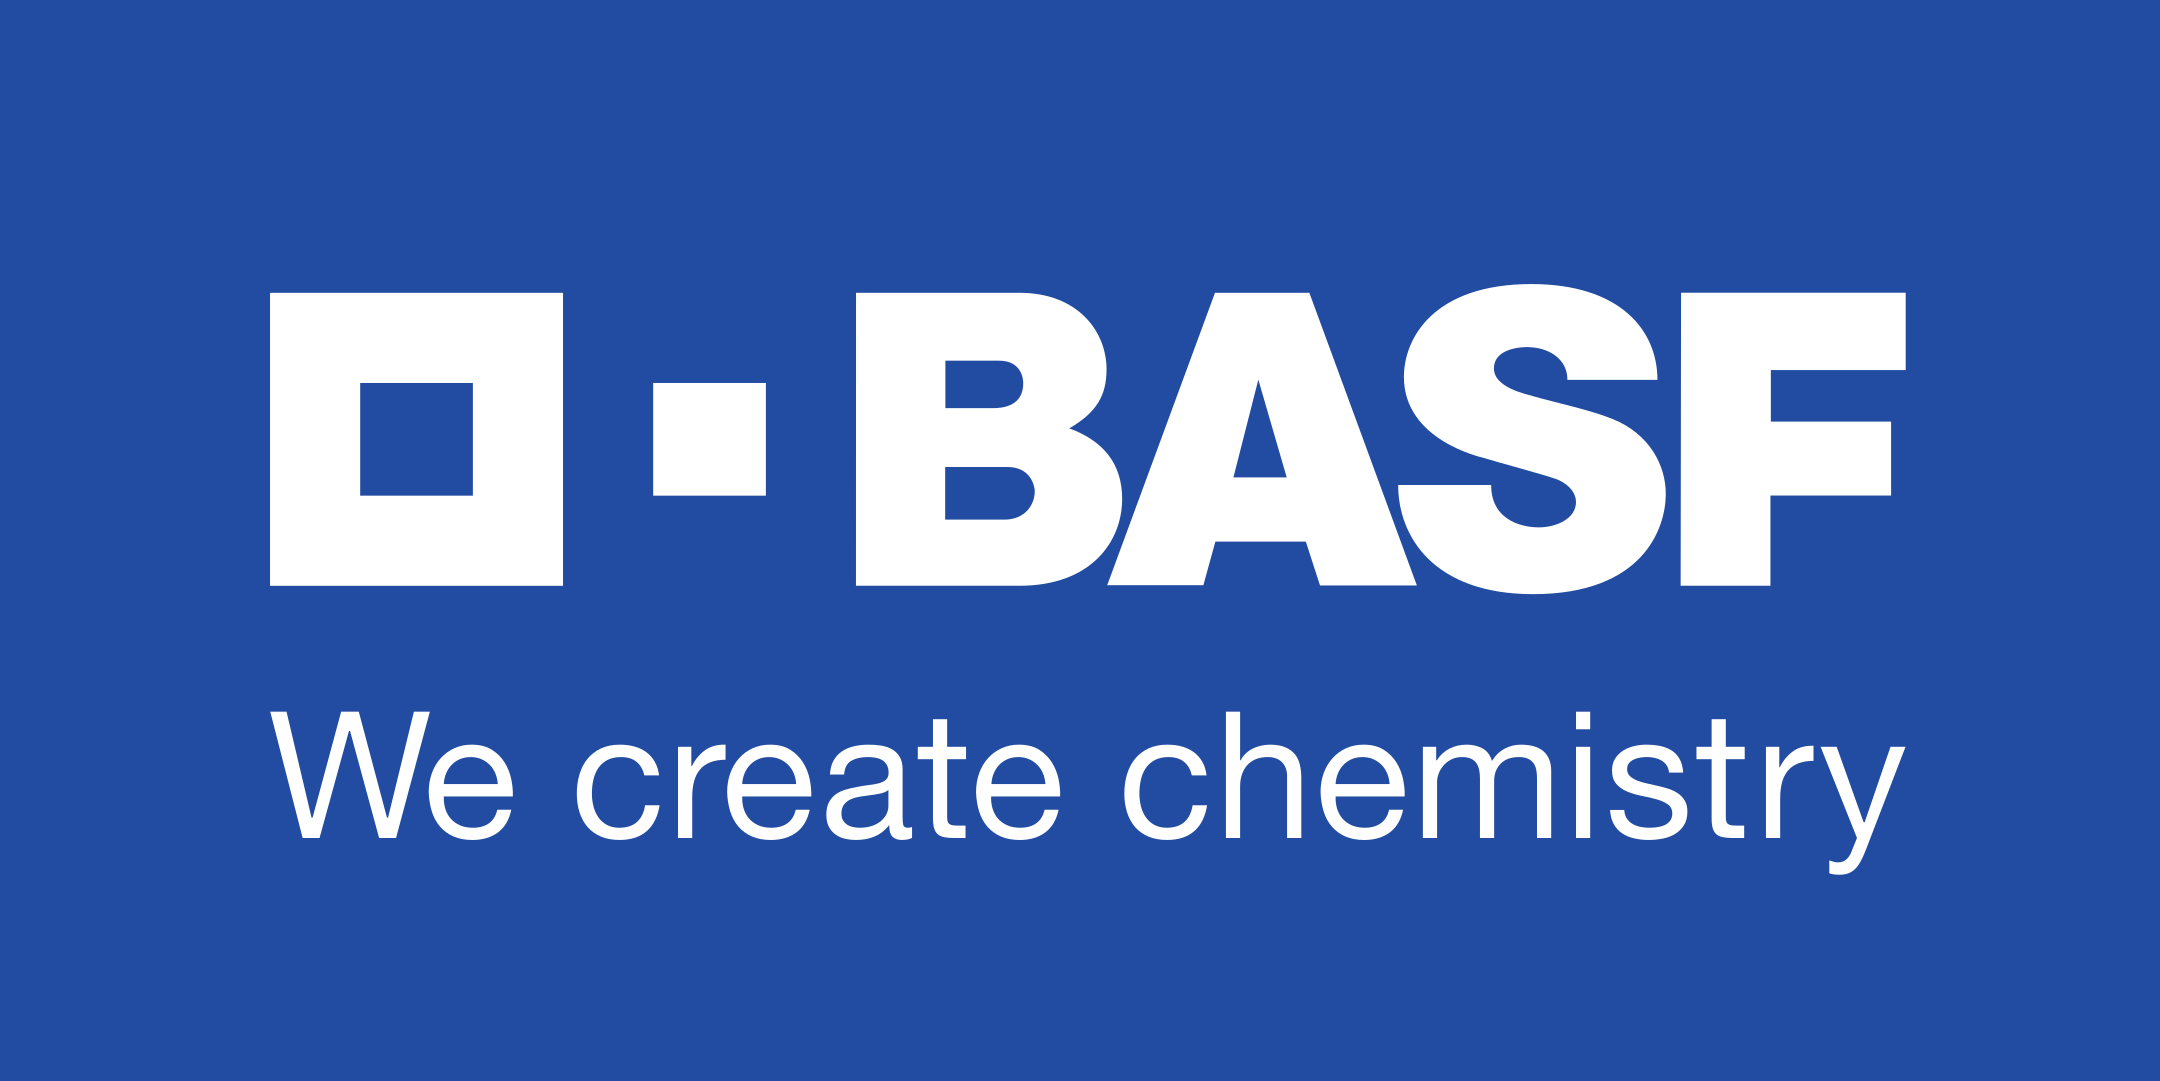 basf logo 1 - BASF Logo